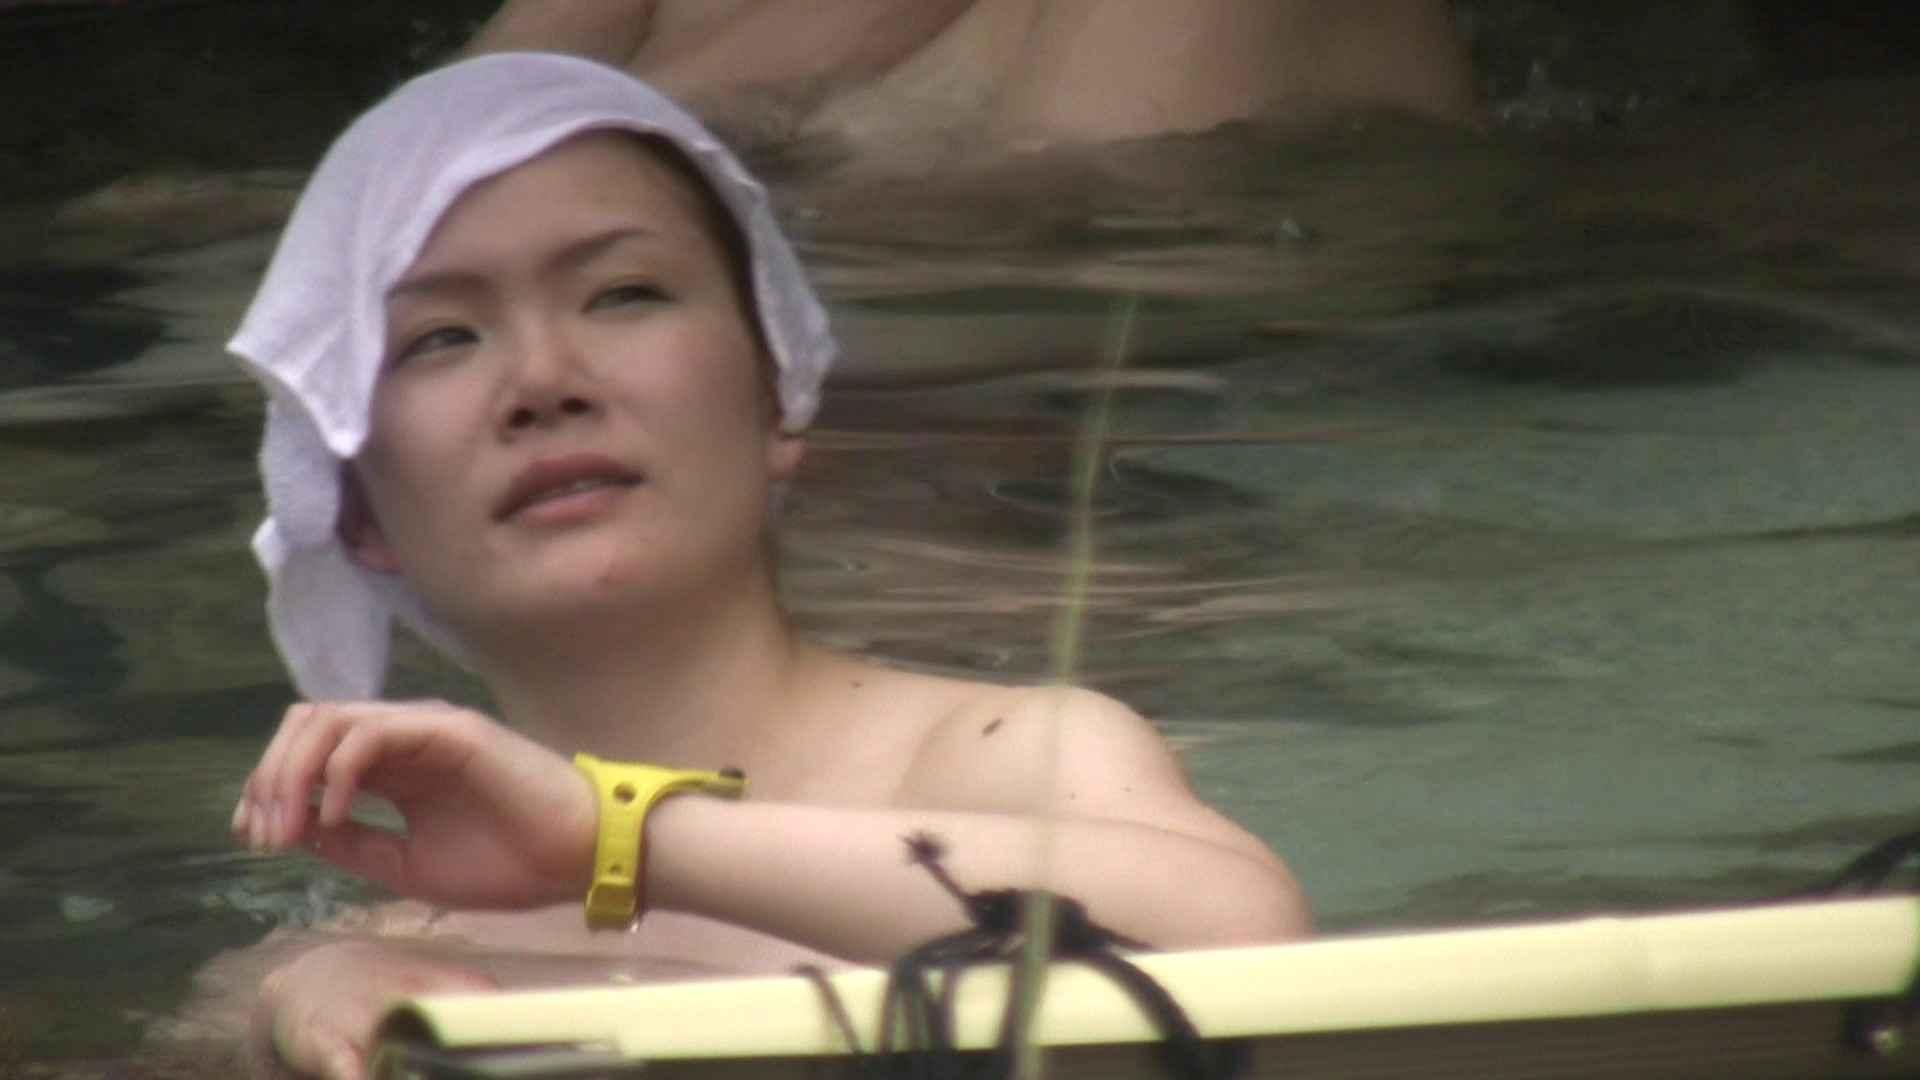 Aquaな露天風呂Vol.12【VIP】 HなOL | 盗撮  83pic 24